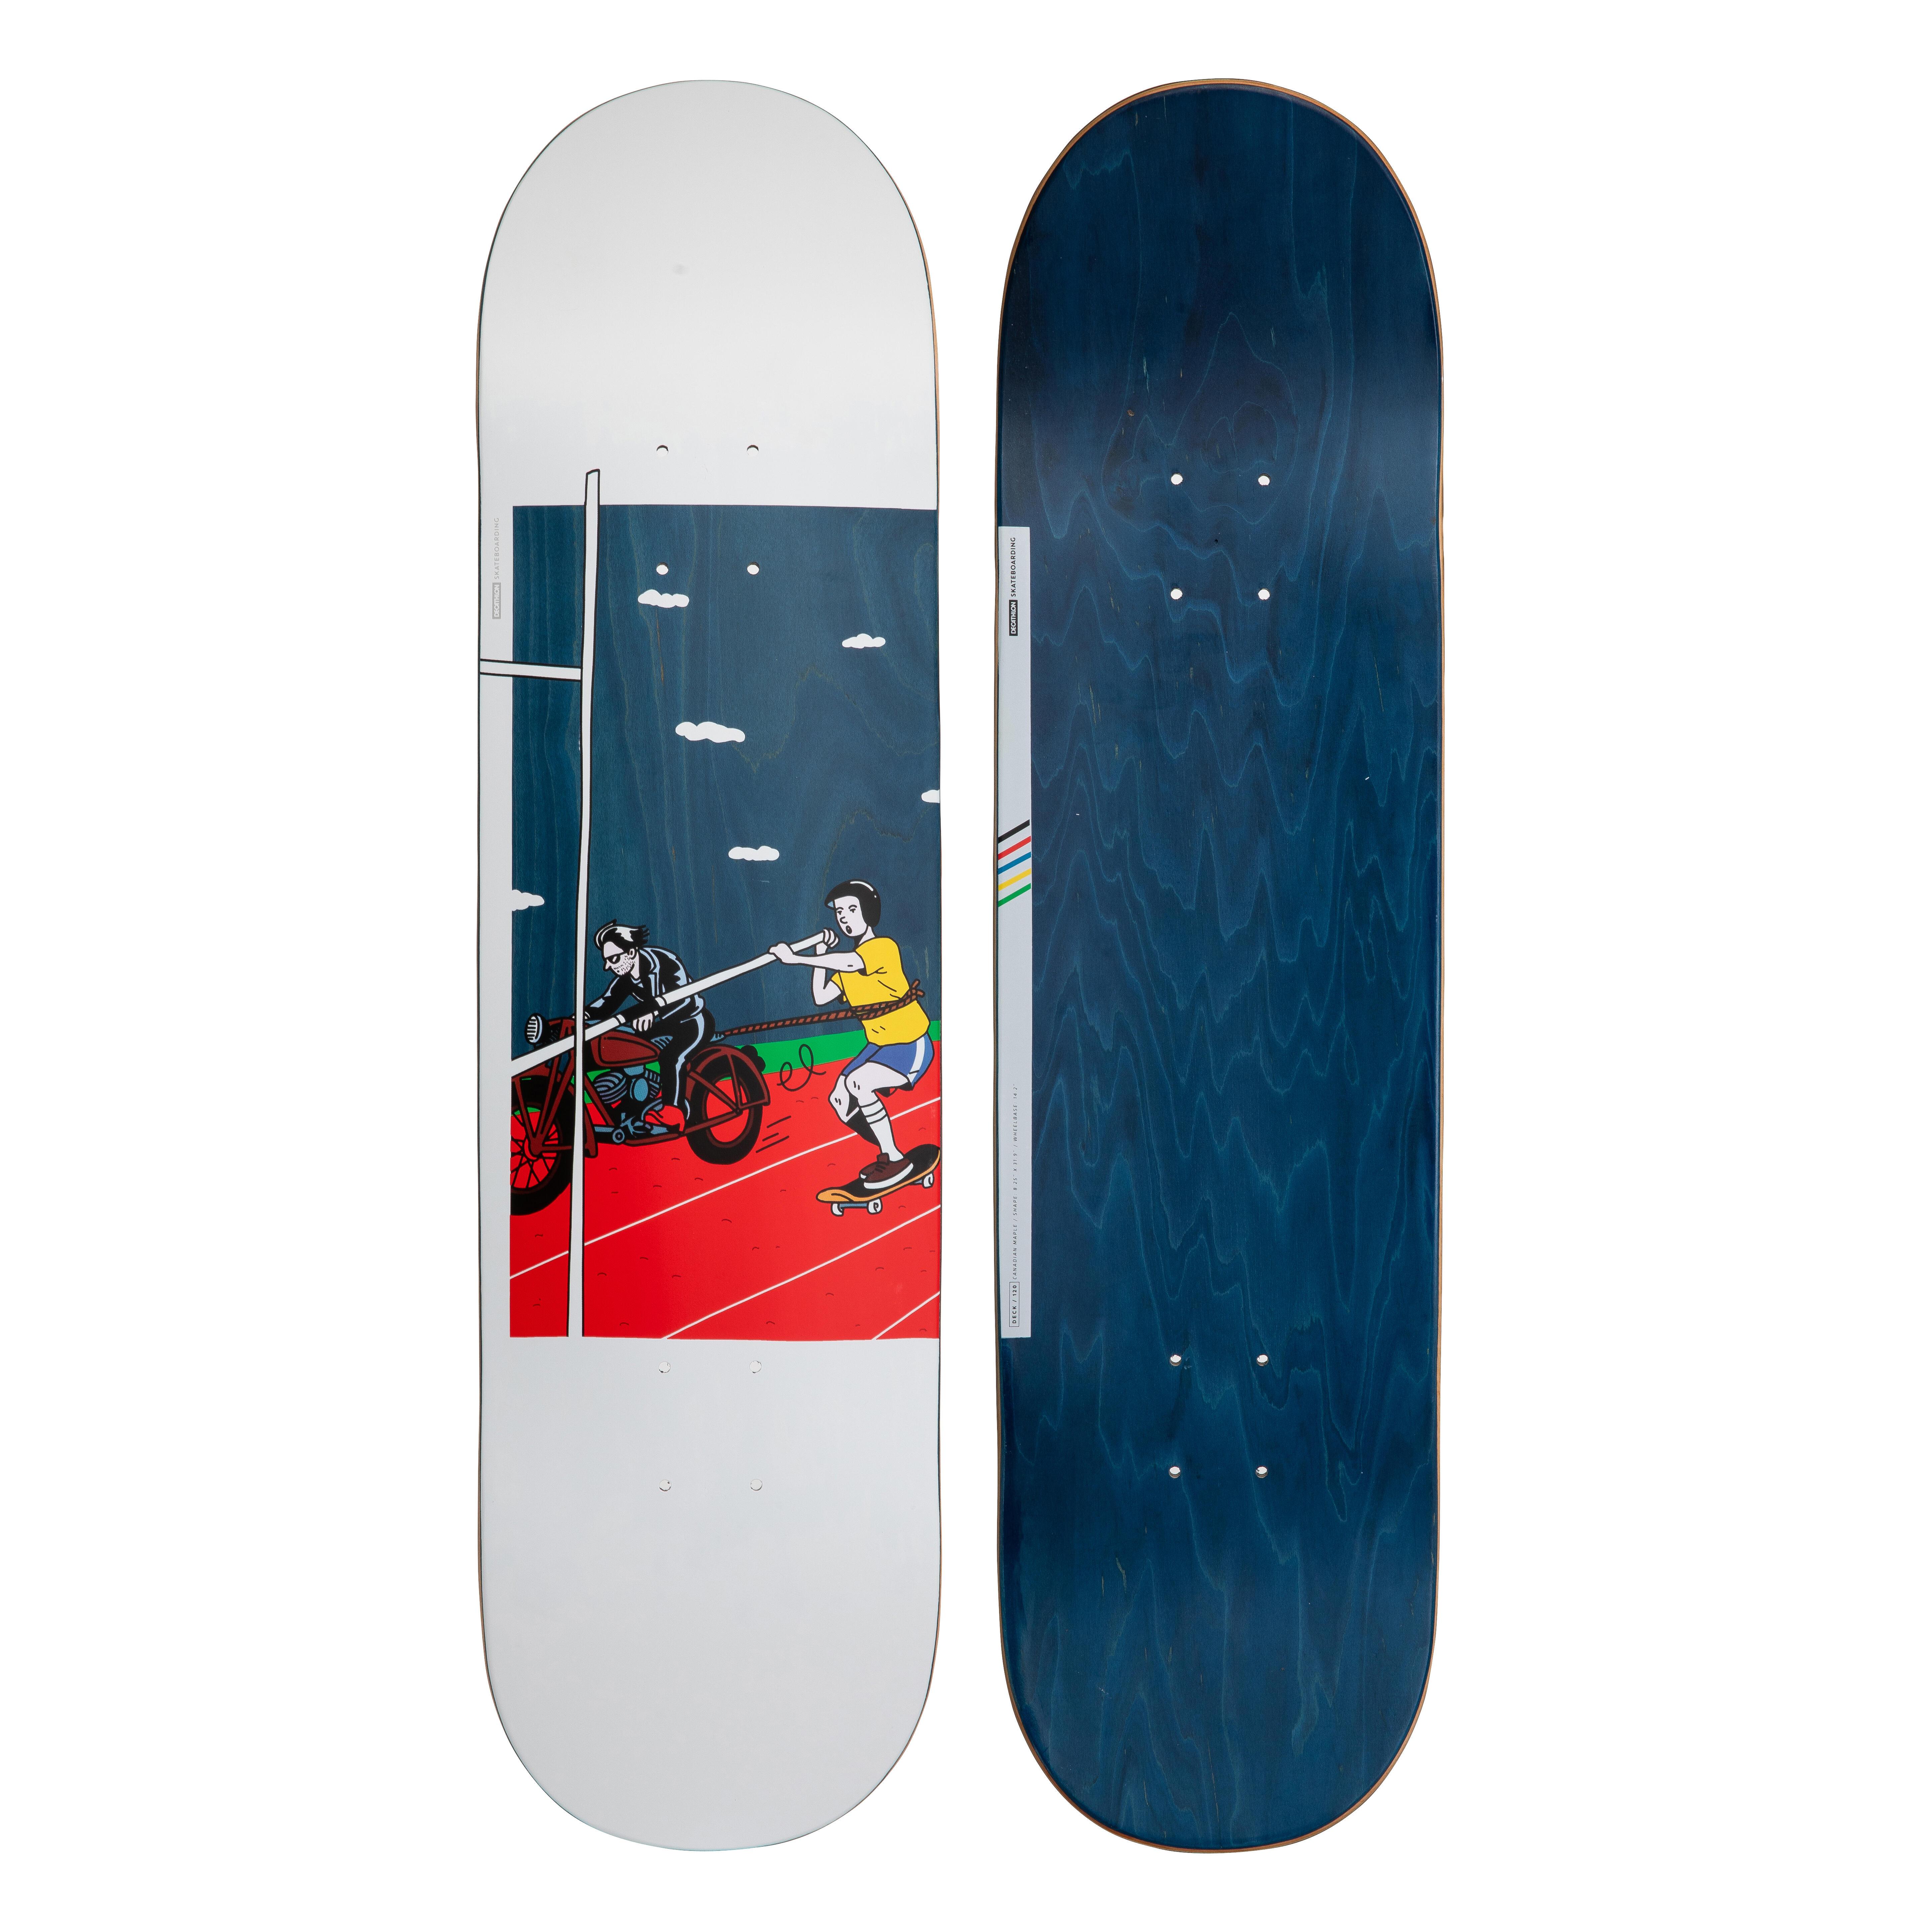 Oxelo PLANCHE DE SKATE DECK 120 BRUCE TAILLE 8.25 BLEUE. - Oxelo